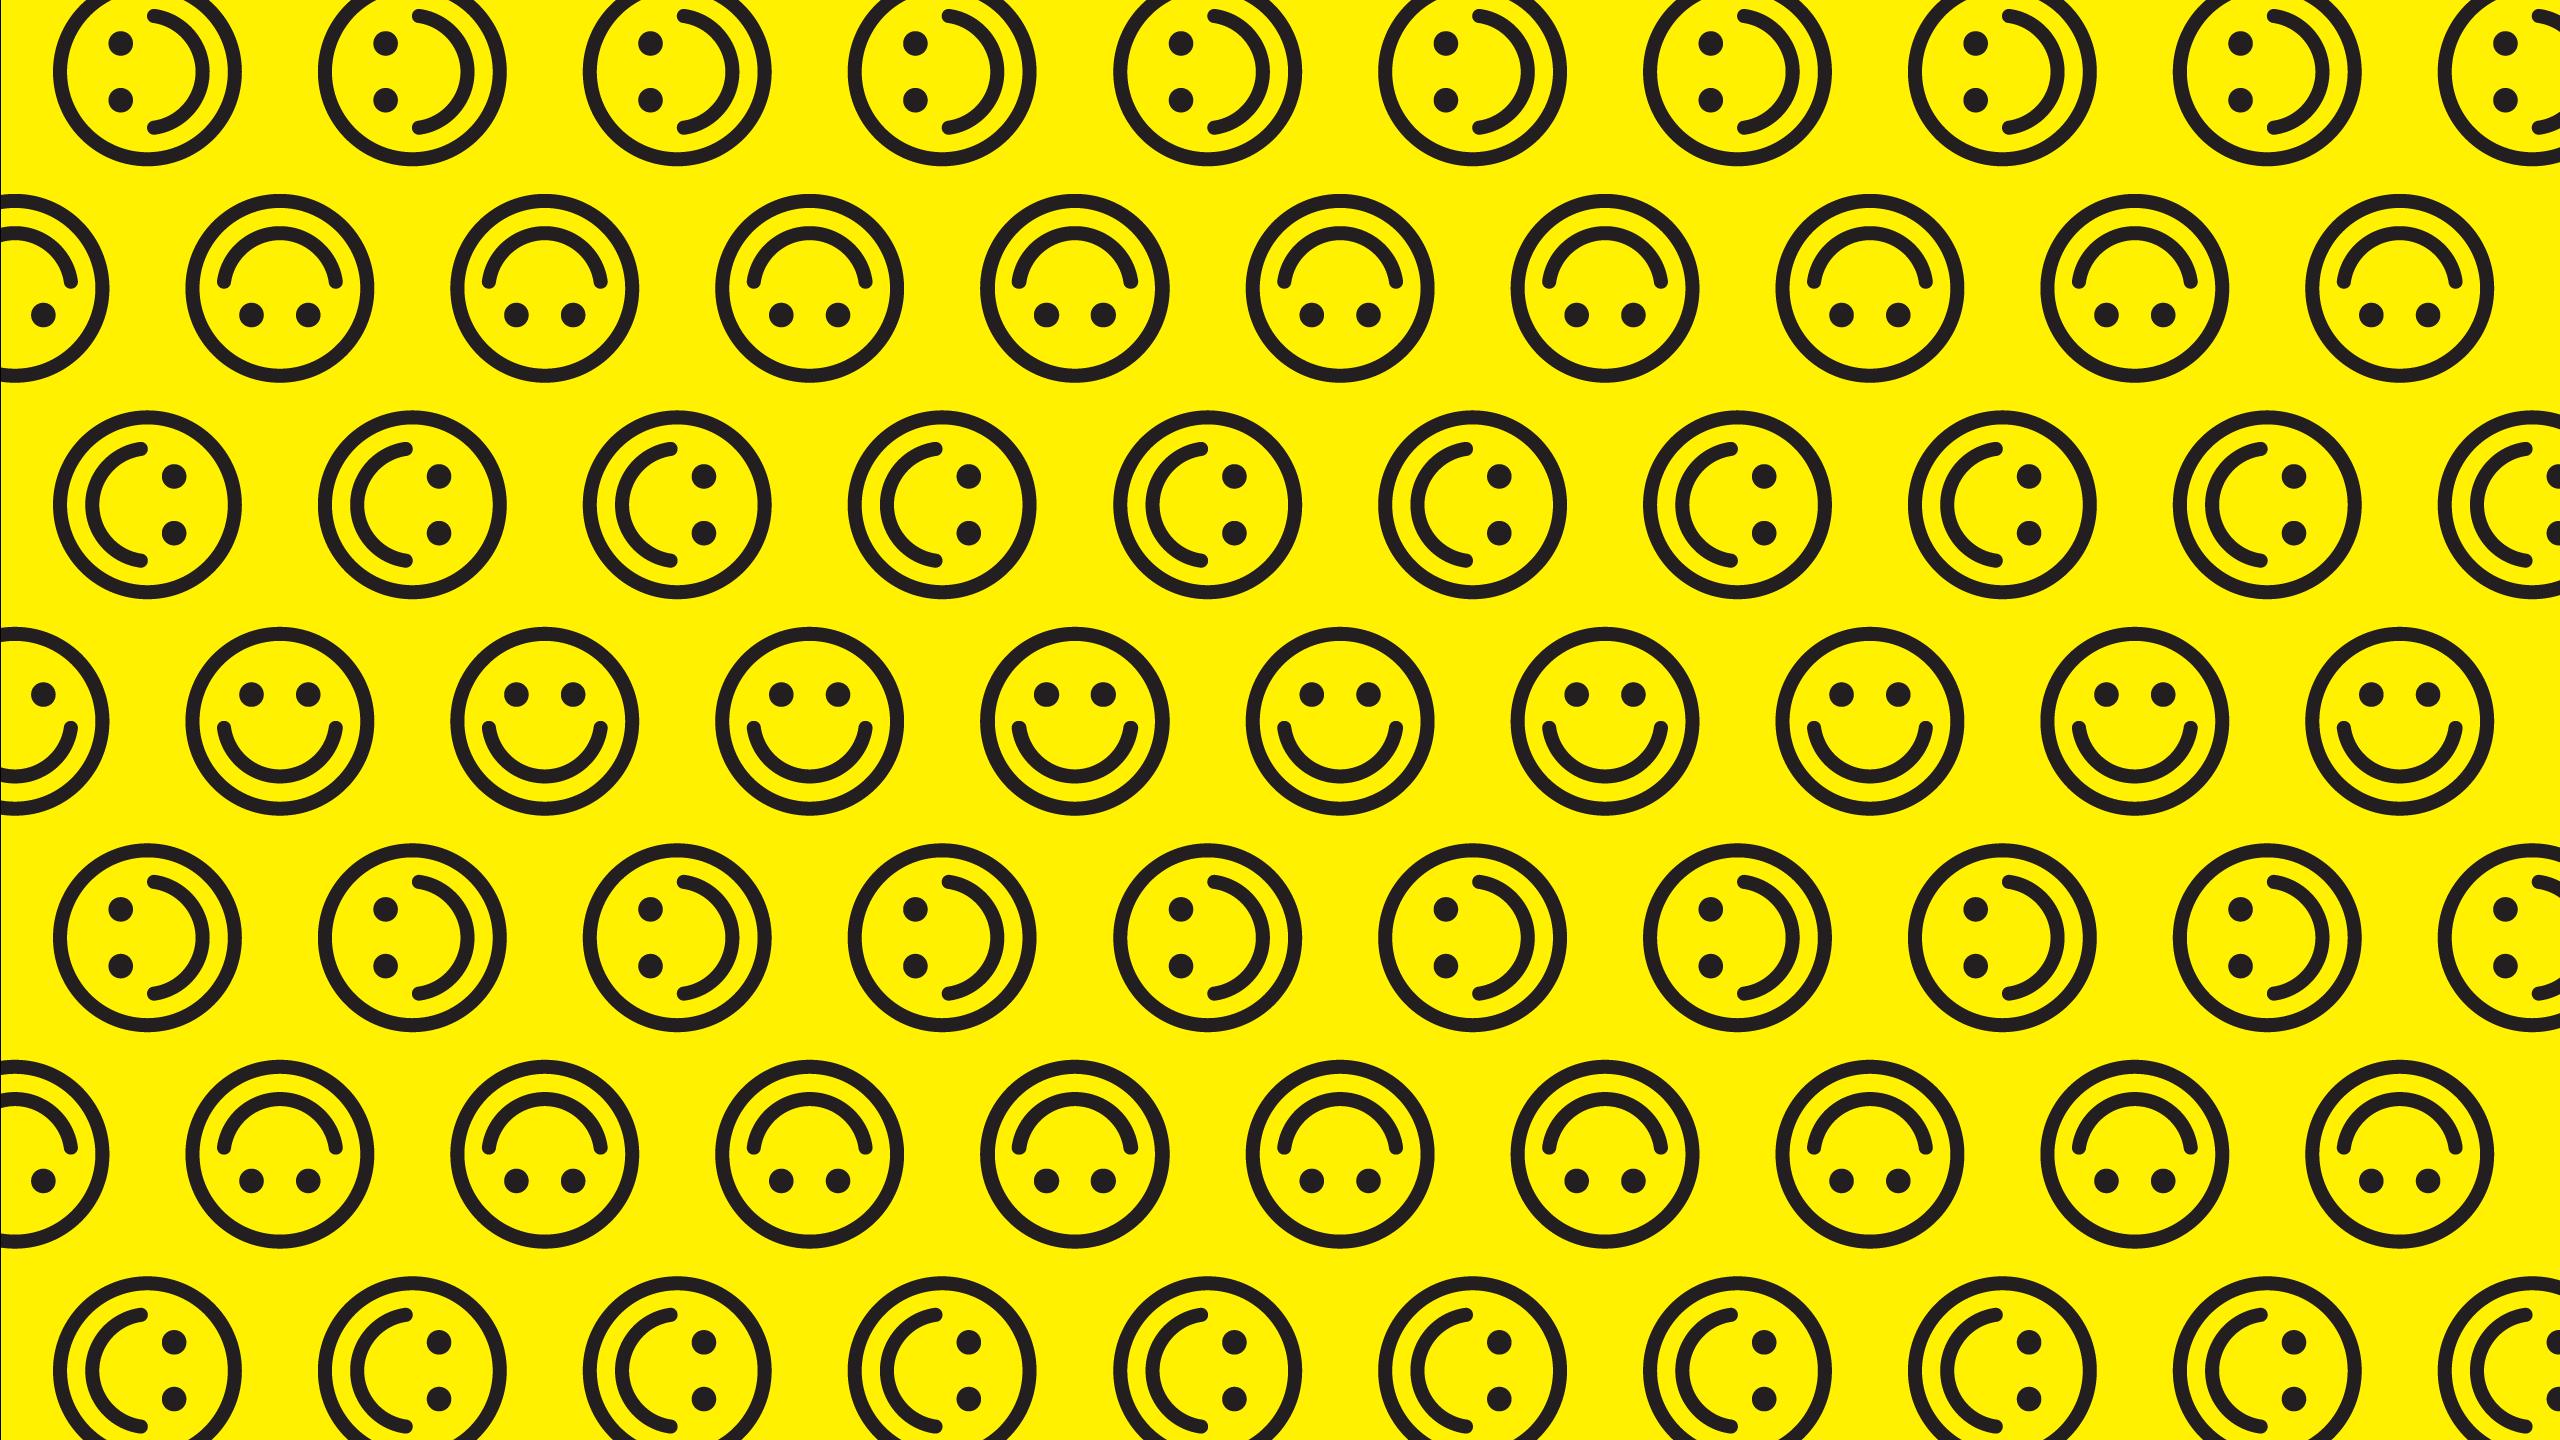 Happy Image Wallpapers 97 Wallpapers Wallpapers 4k